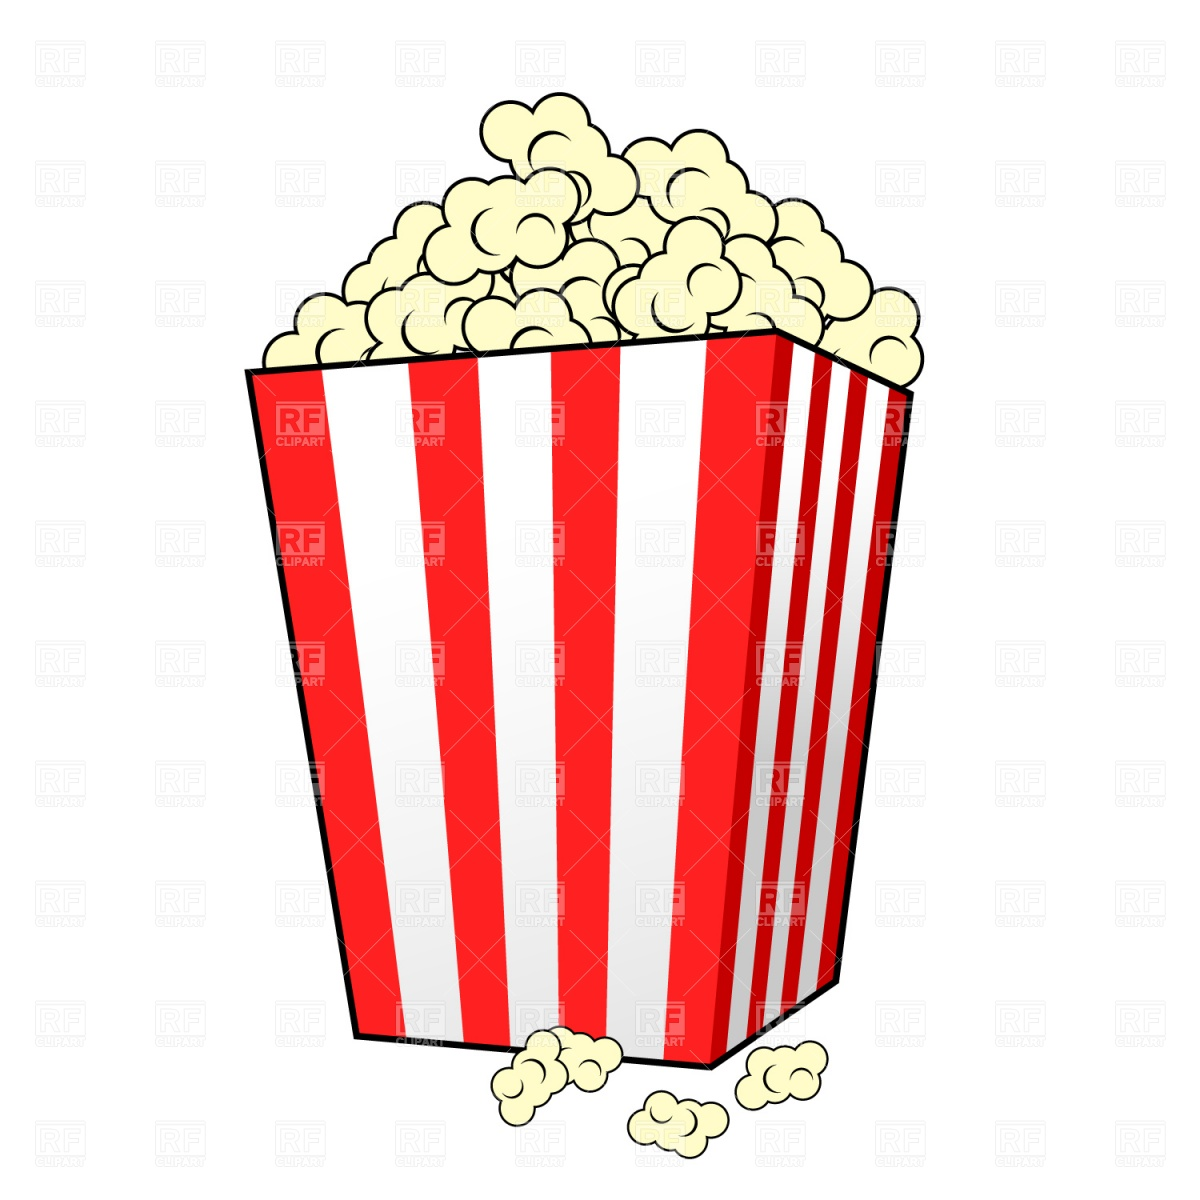 Templates  clipart popcorn Clipart Popcorn movie%20popcorn%20clipart Clipart Panda